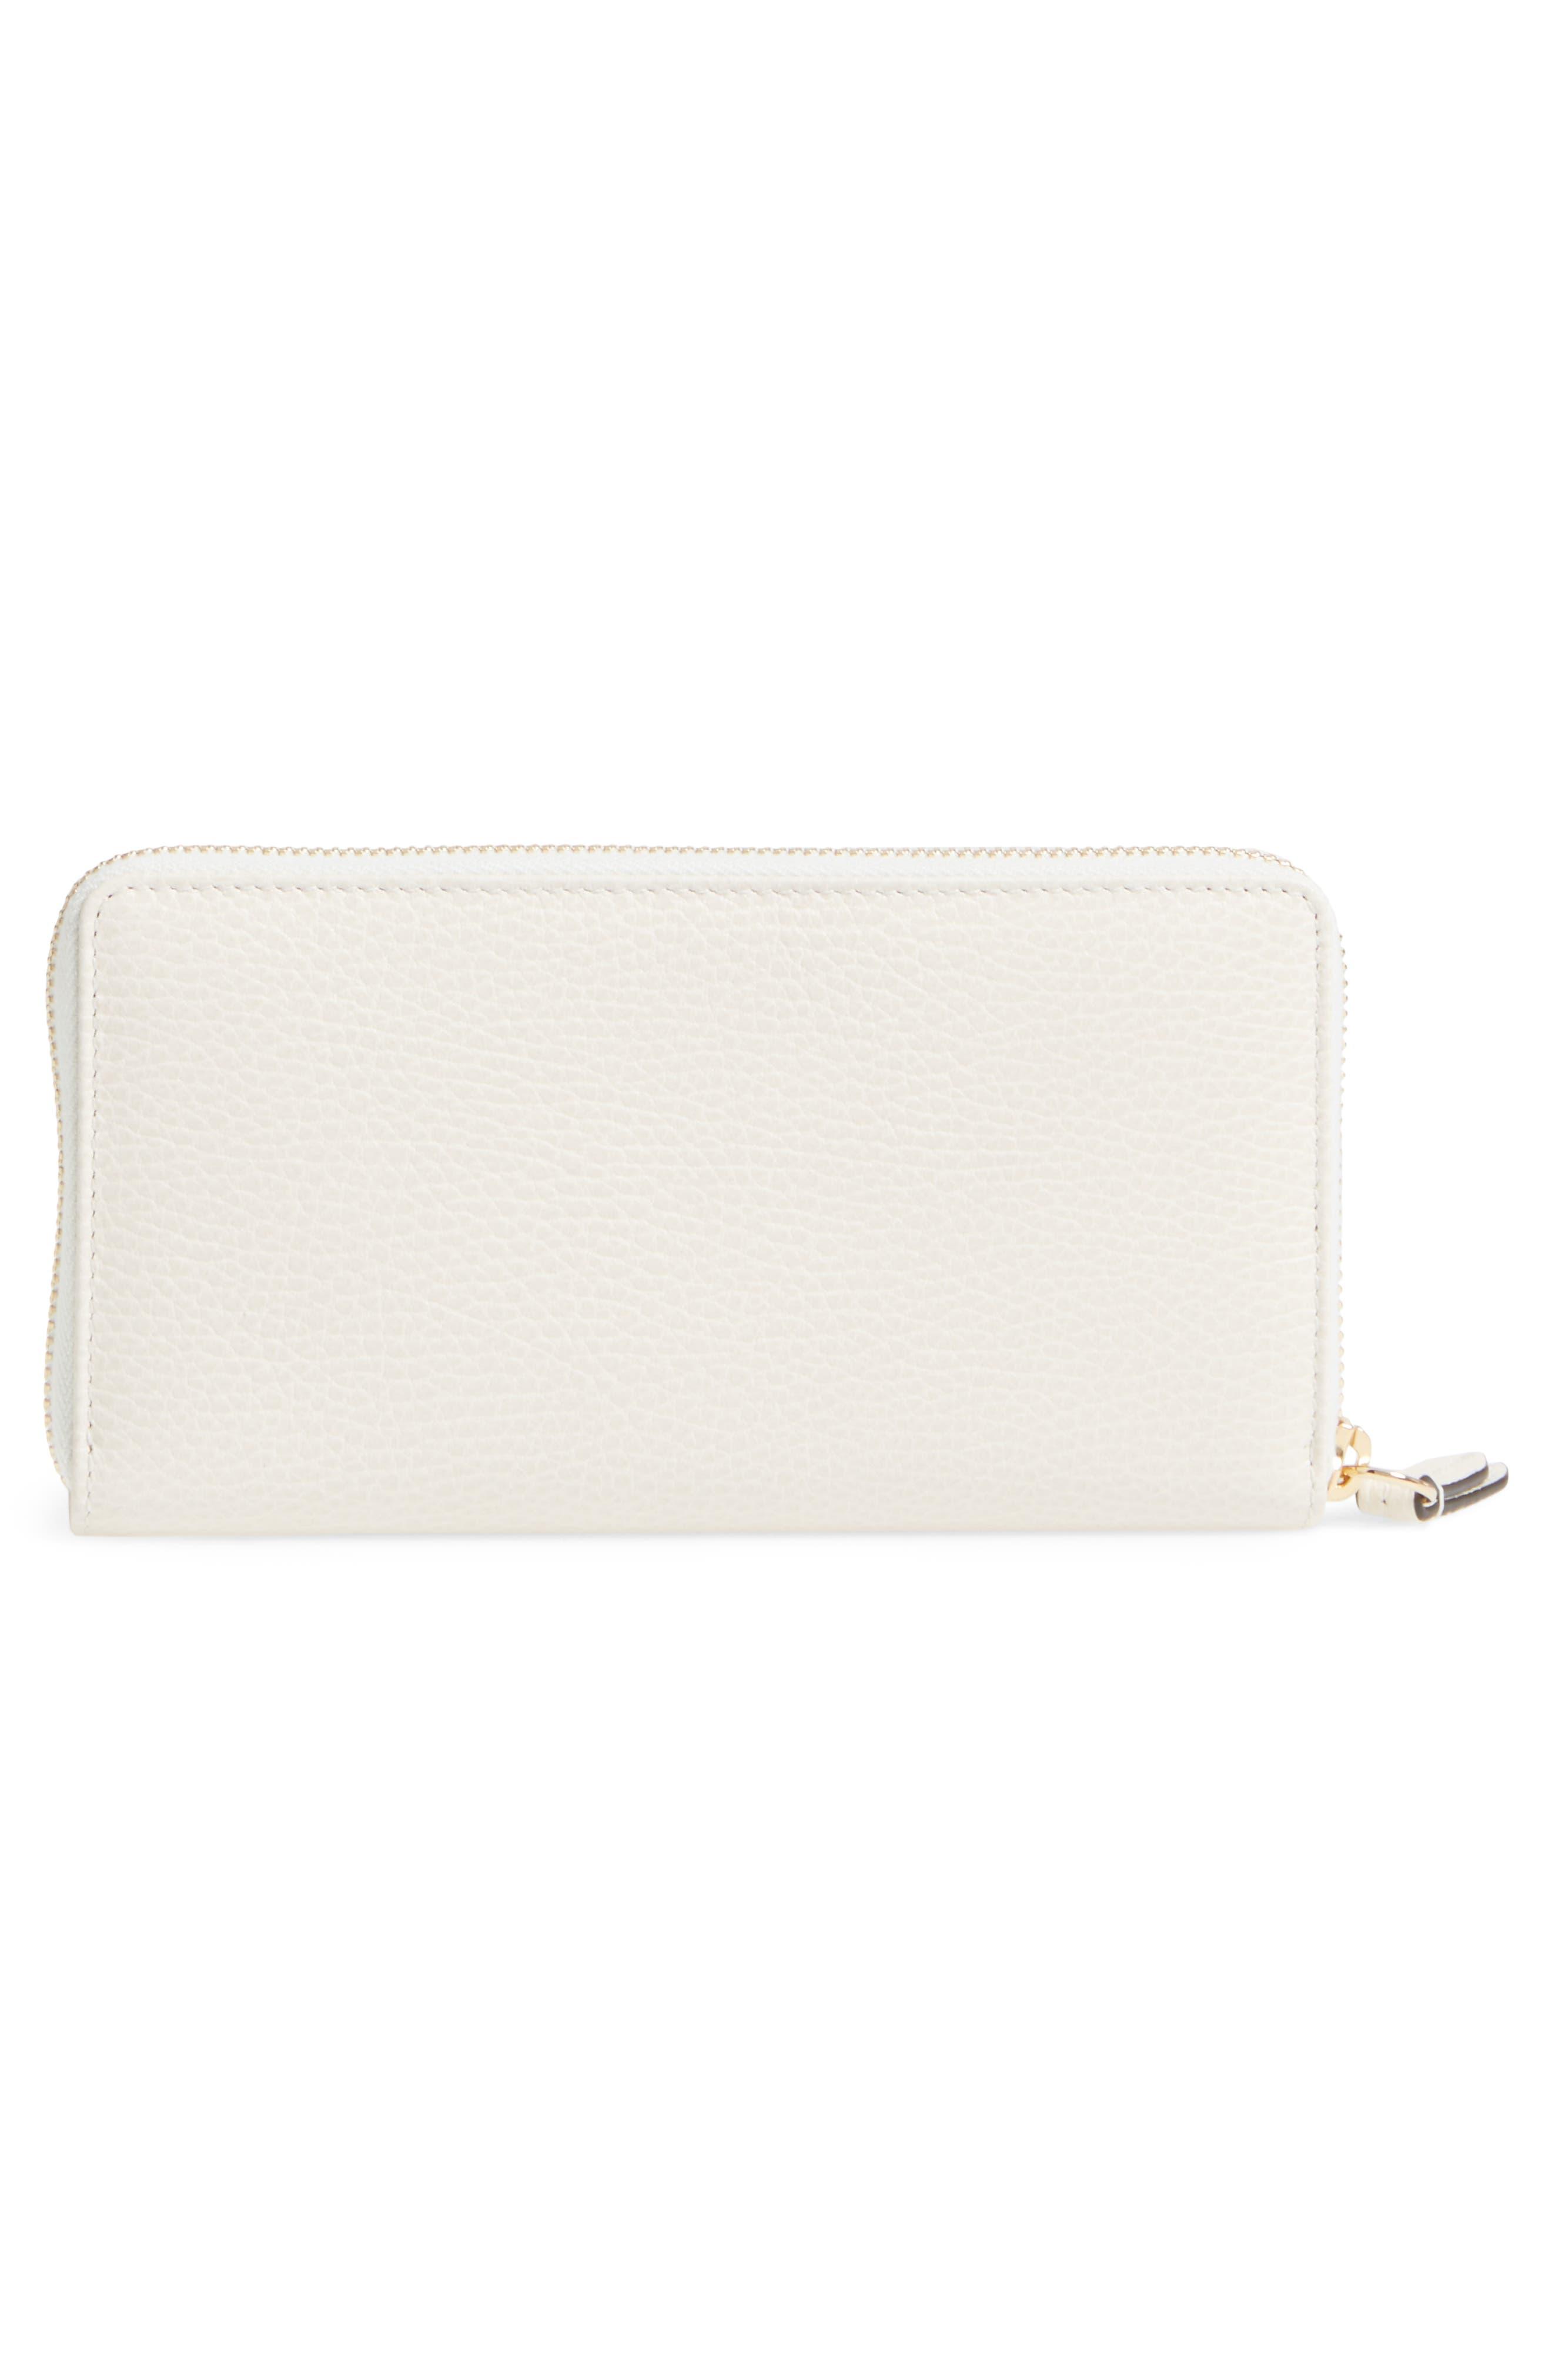 Petite Marmont Leather Zip Around Wallet,                             Alternate thumbnail 3, color,                             MYSTIC WHITE